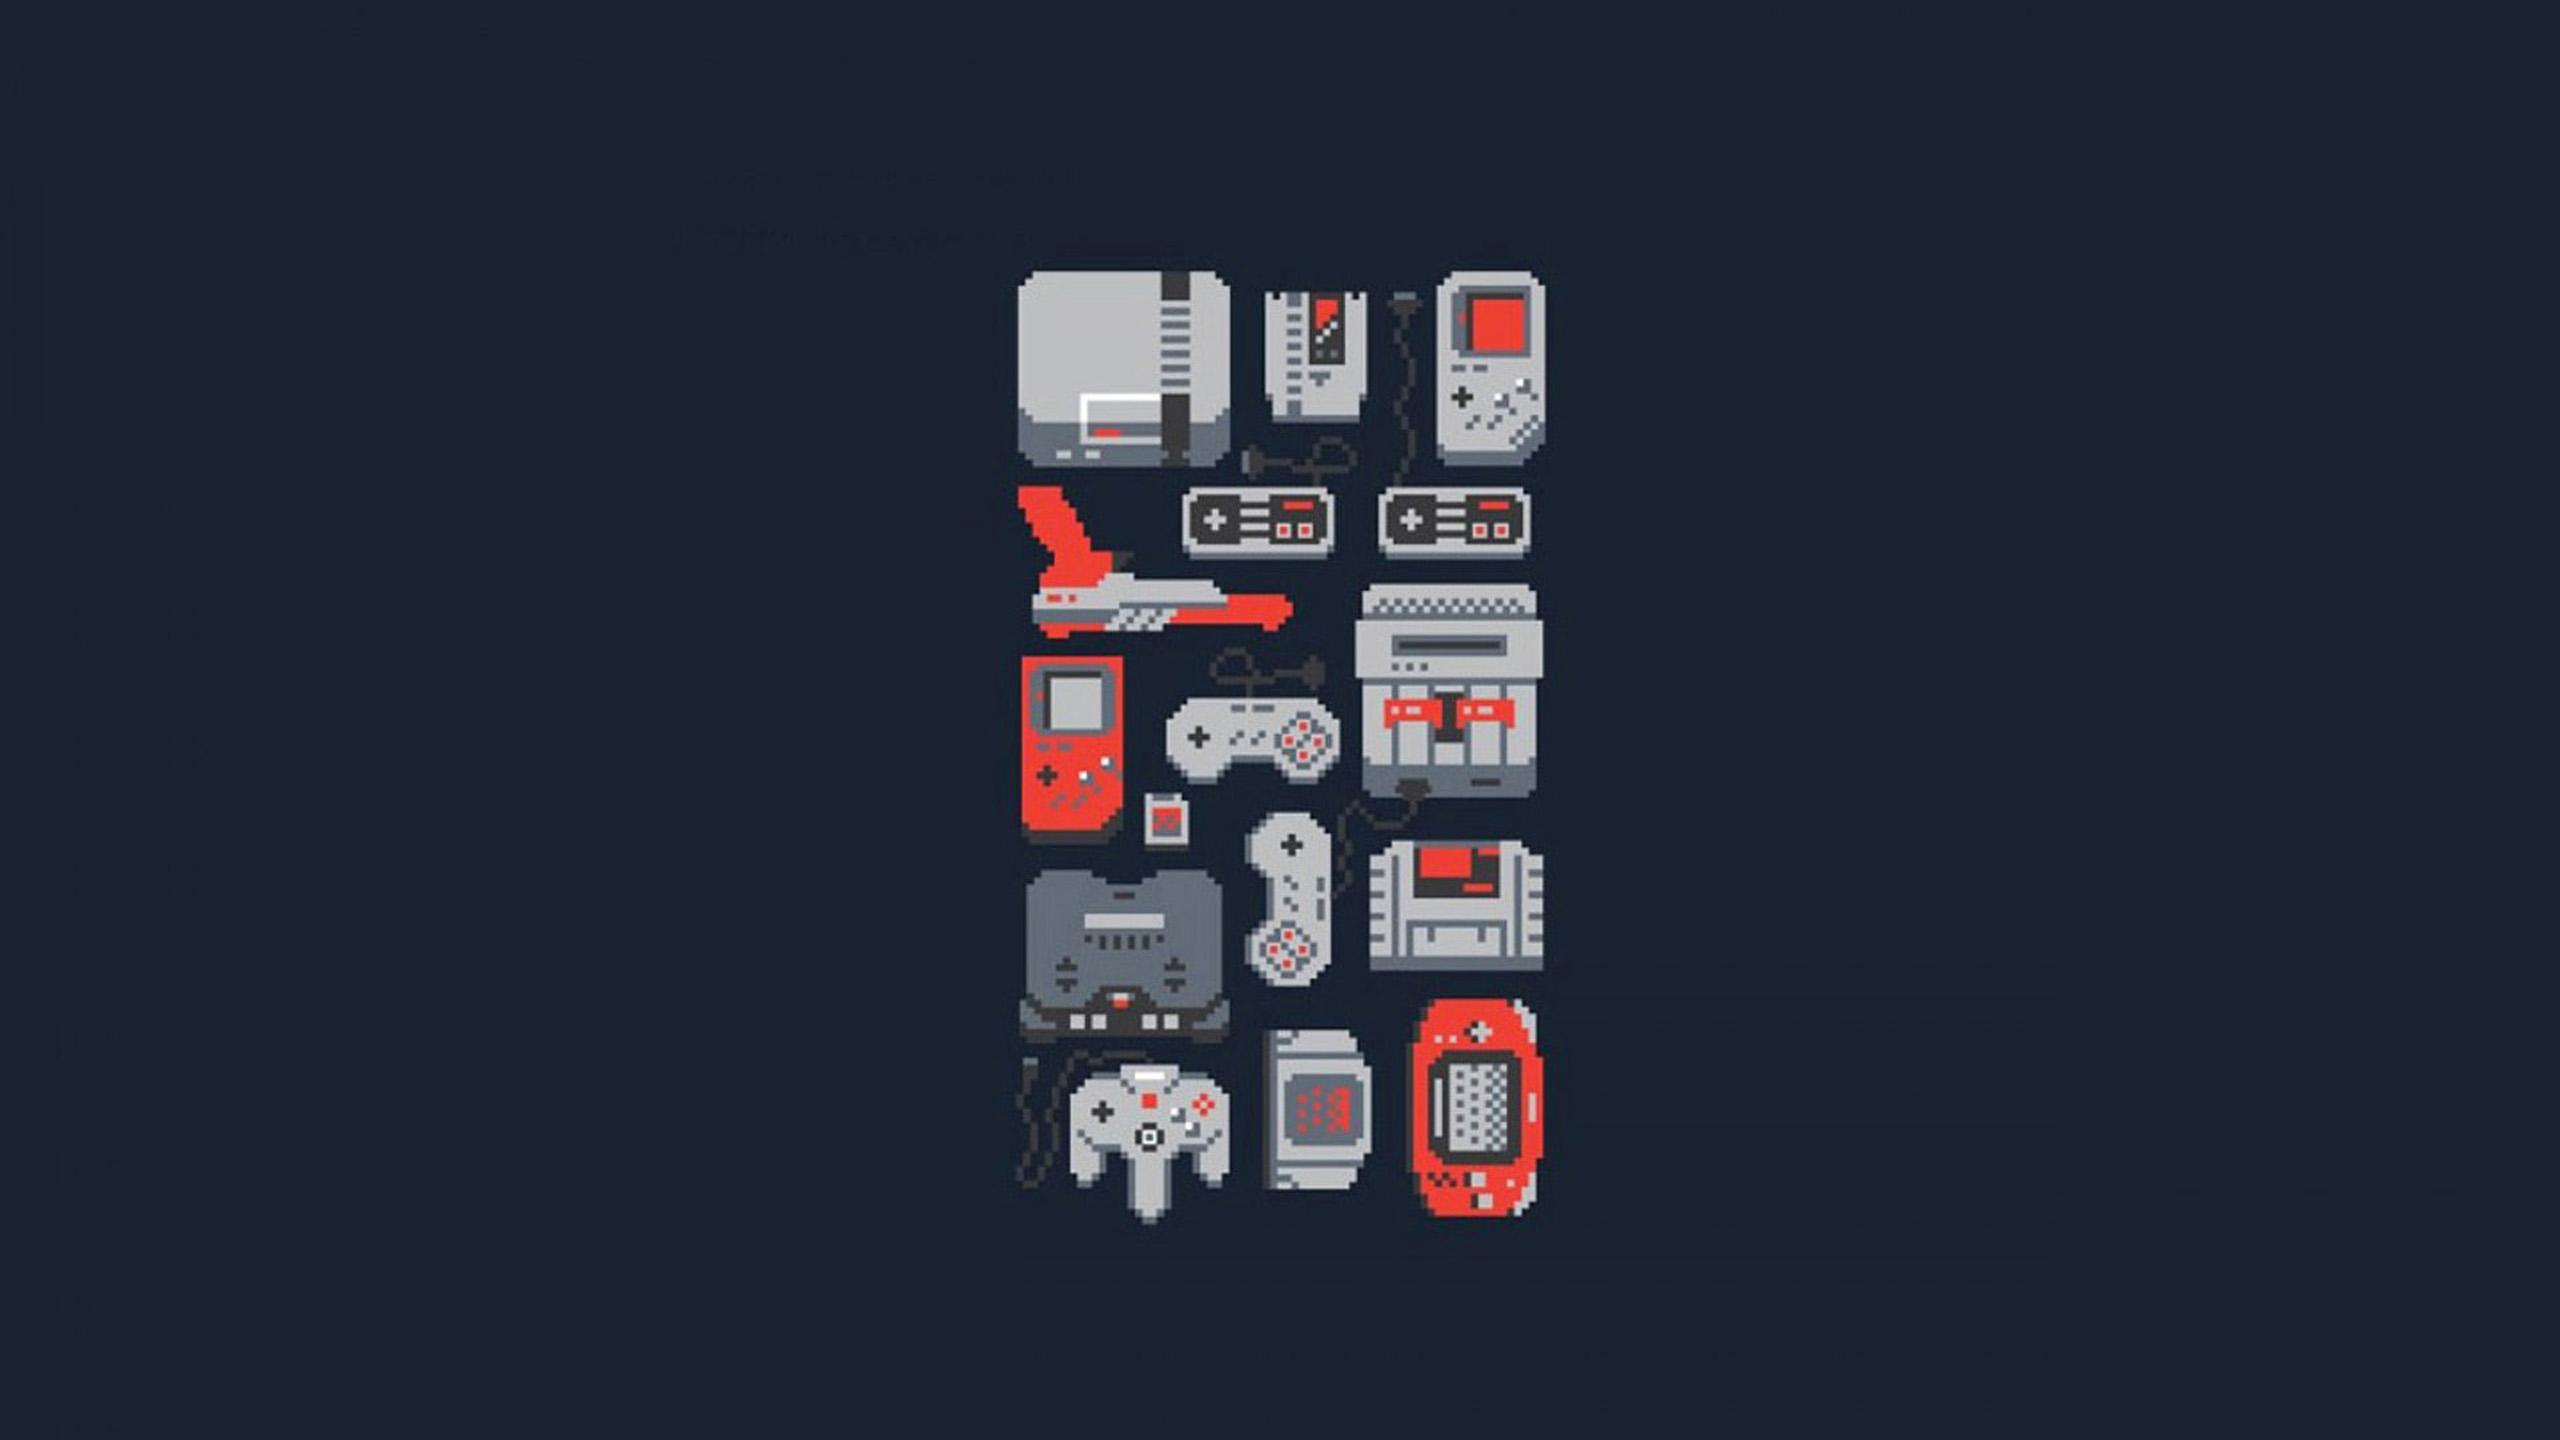 29955 retro gaming wallpaper 2560x1440